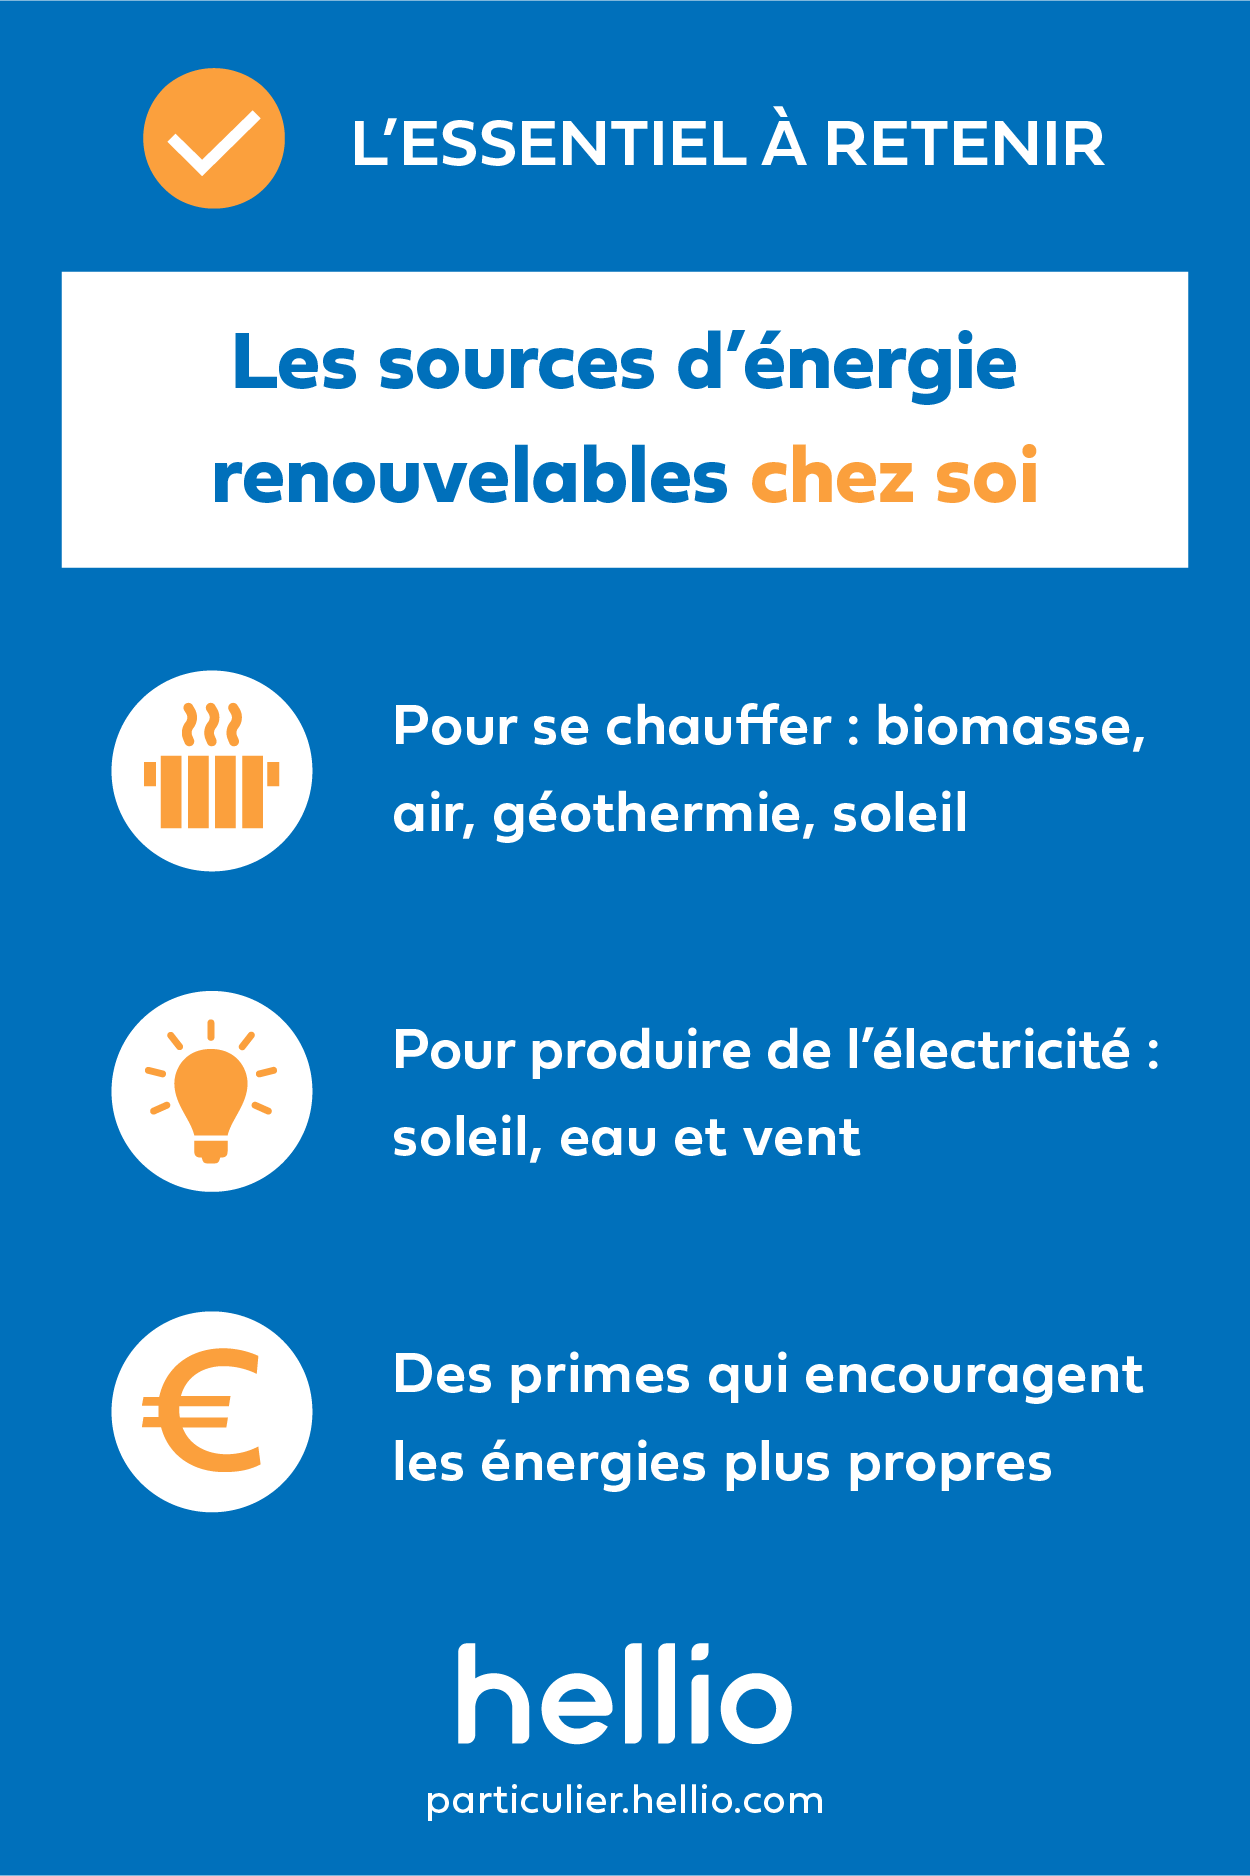 infographie-essentiel-retenir-hellio-particulier-sources-energie-renouvelables